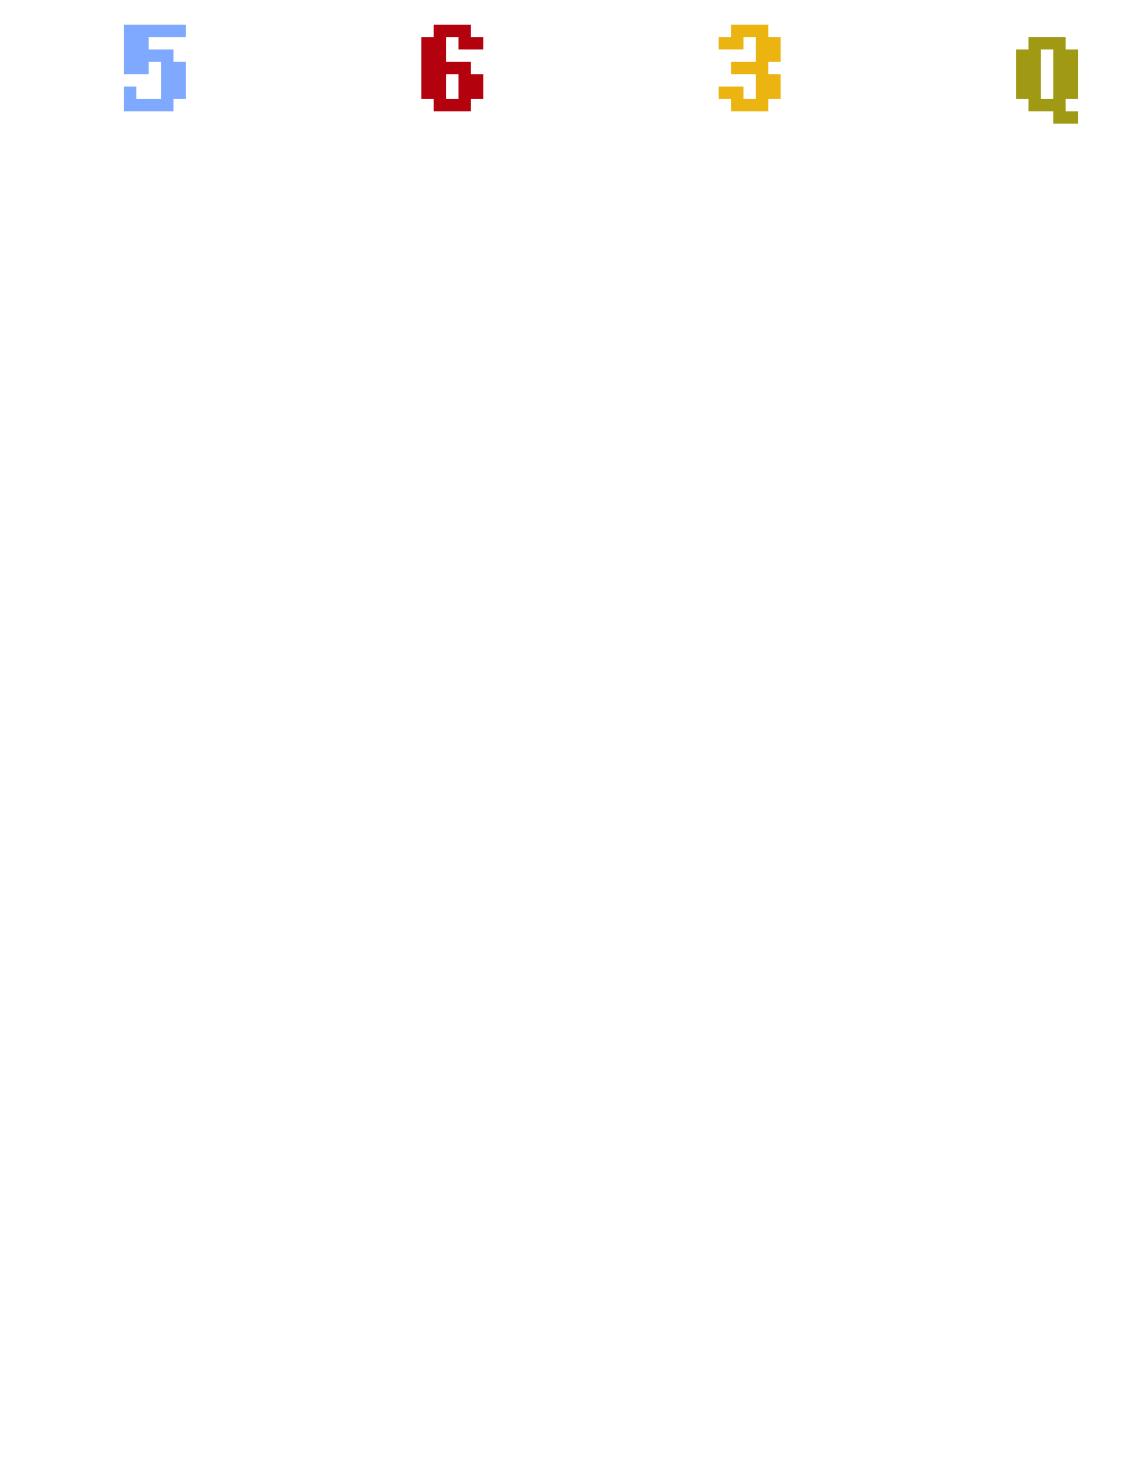 highland-heather-ale-recipe1.jpg